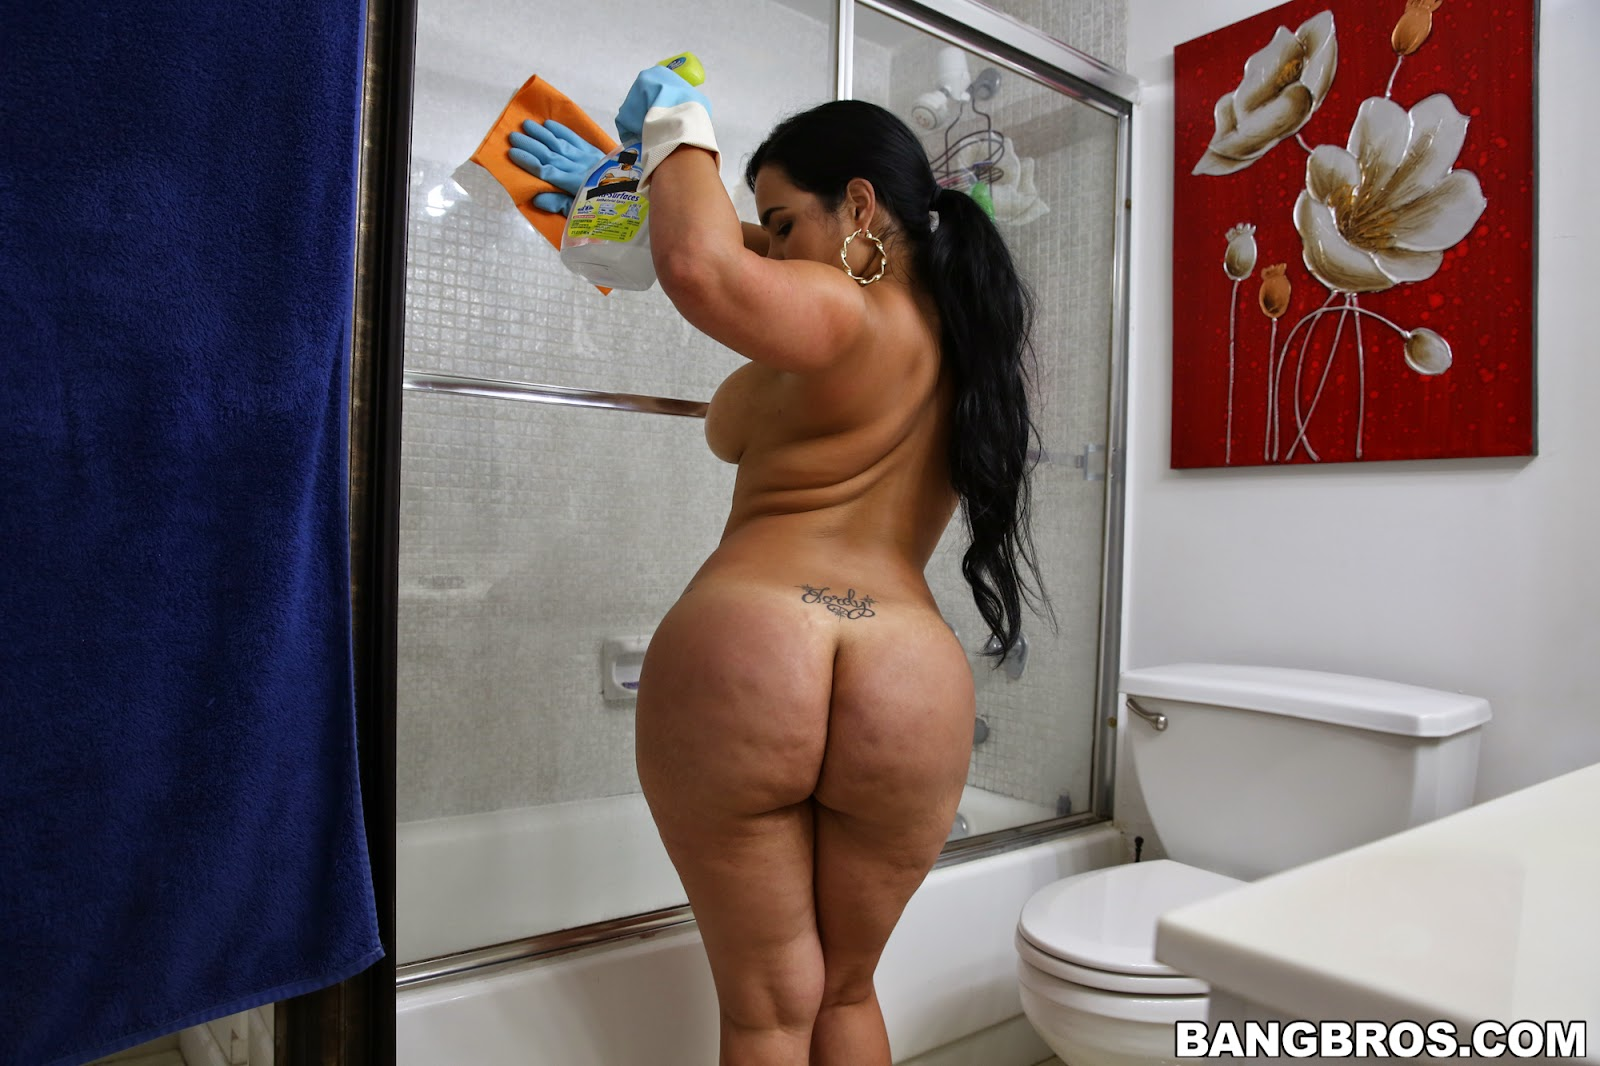 Cuban babe angelina castro fucks her teddy bear in 2012 vid - 2 part 5